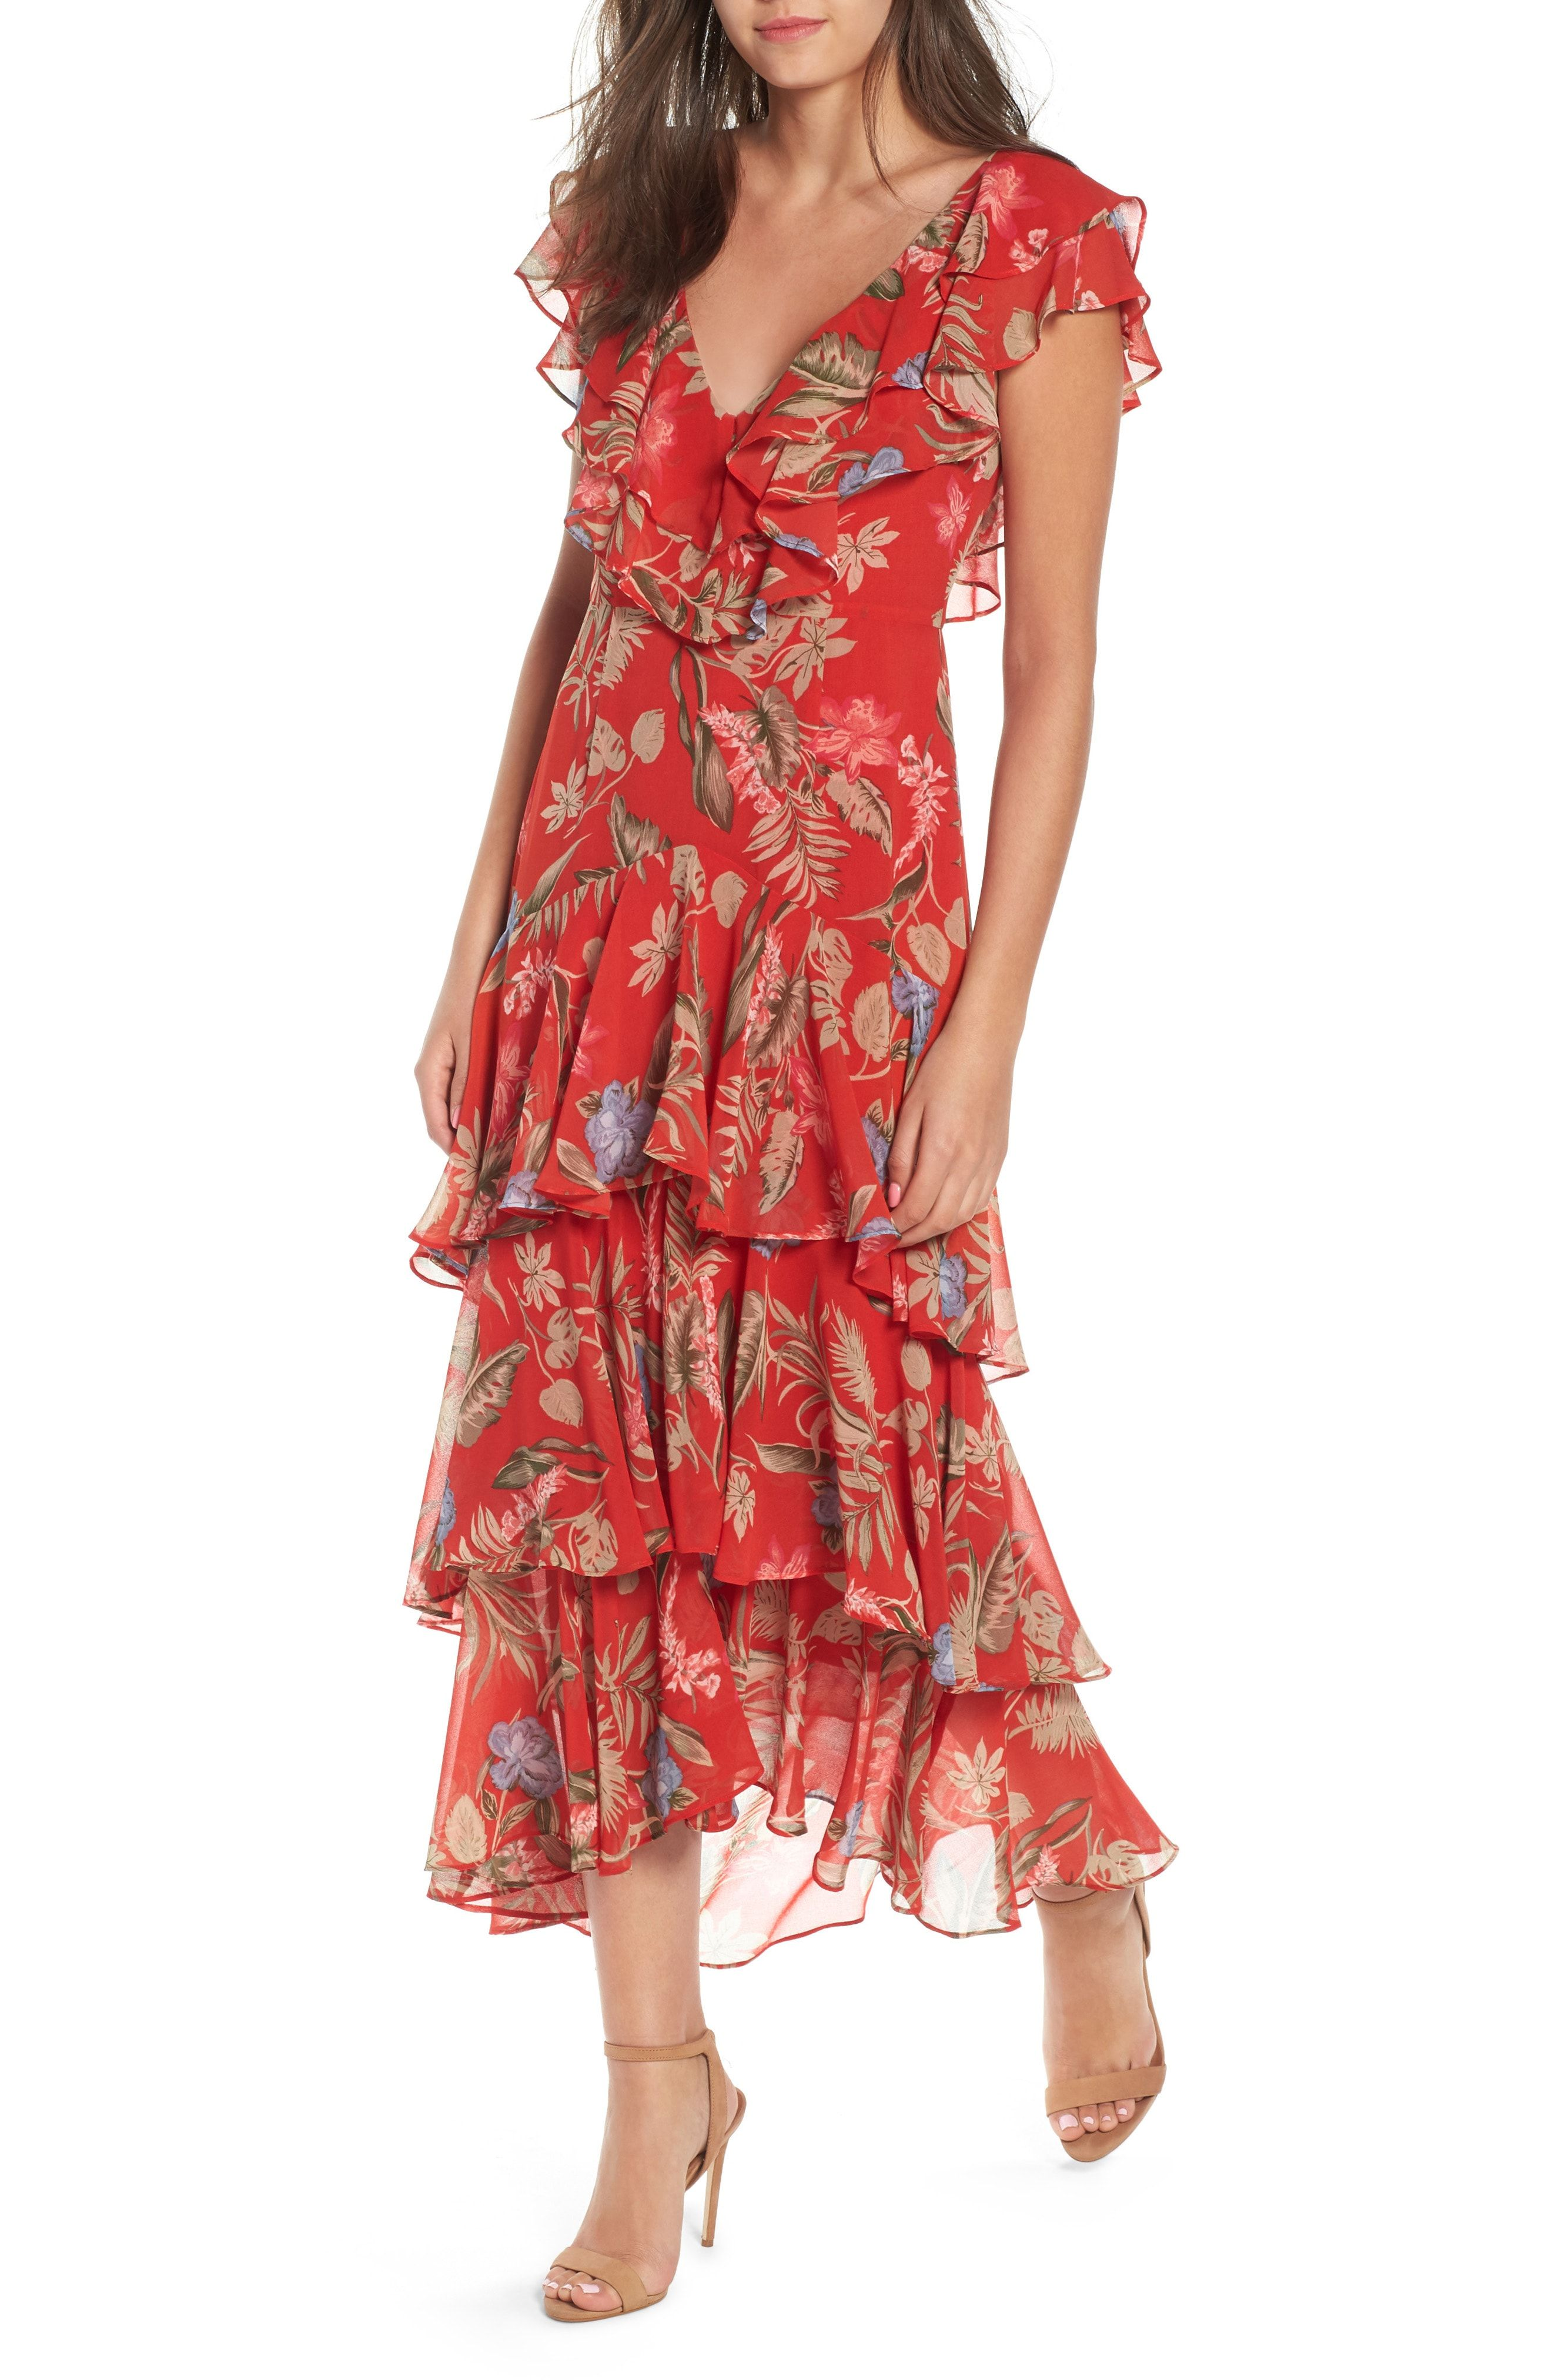 dd0ed331c65 The Best Fall Wedding Guest Dresses